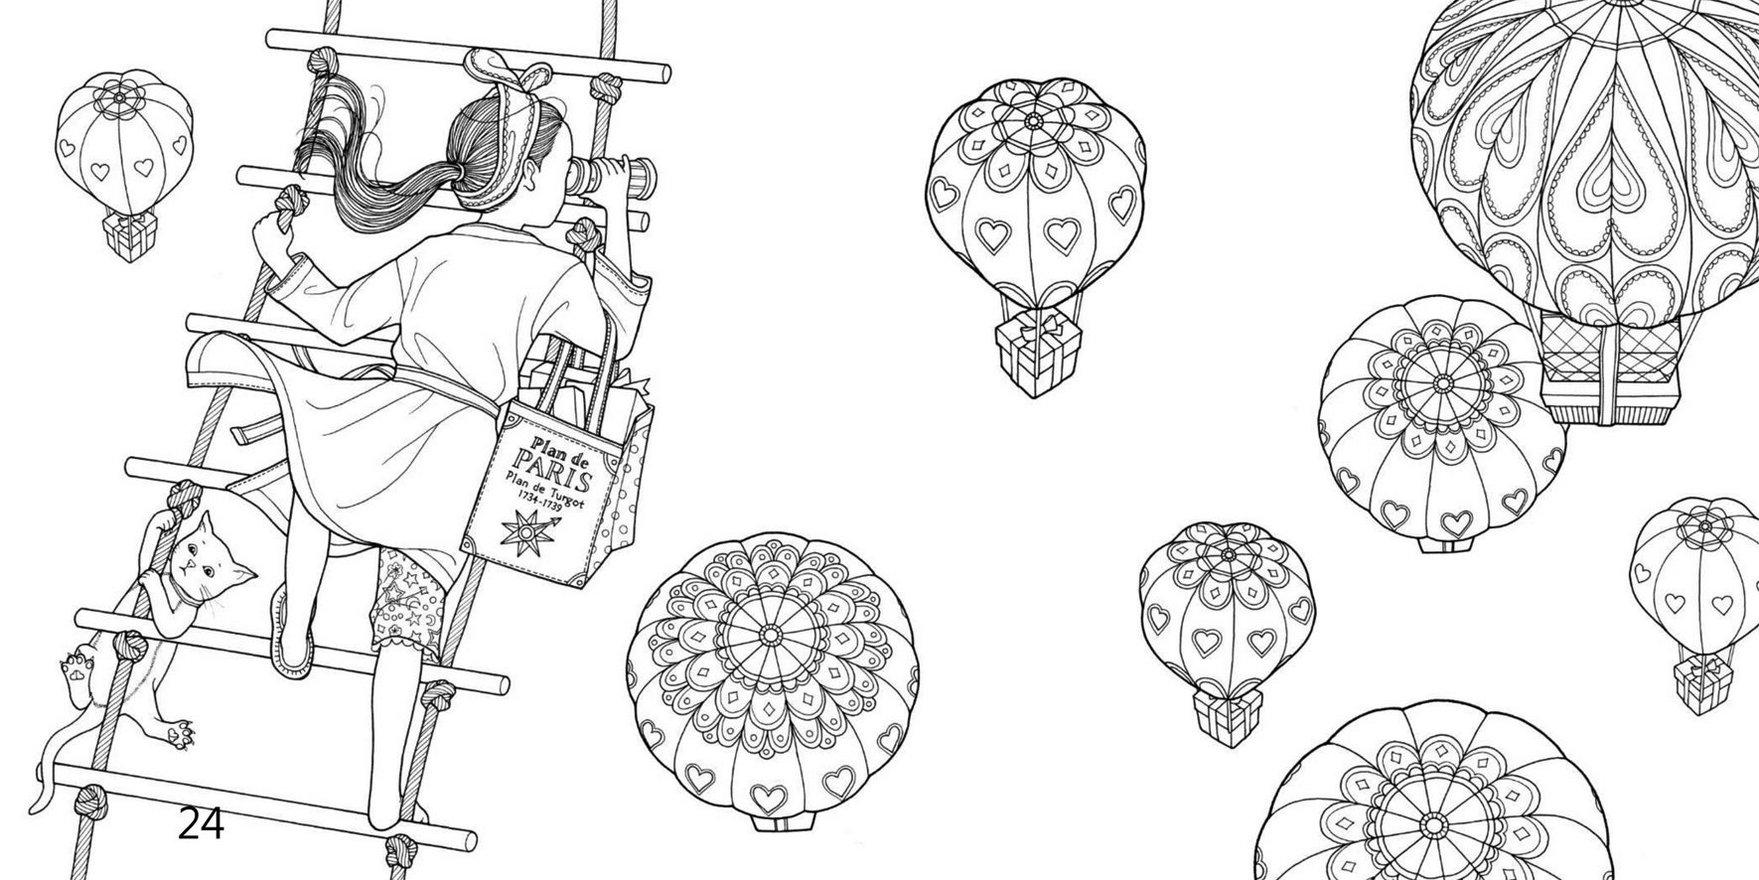 Hot Air Balloon Filed Skies The Night Voyage